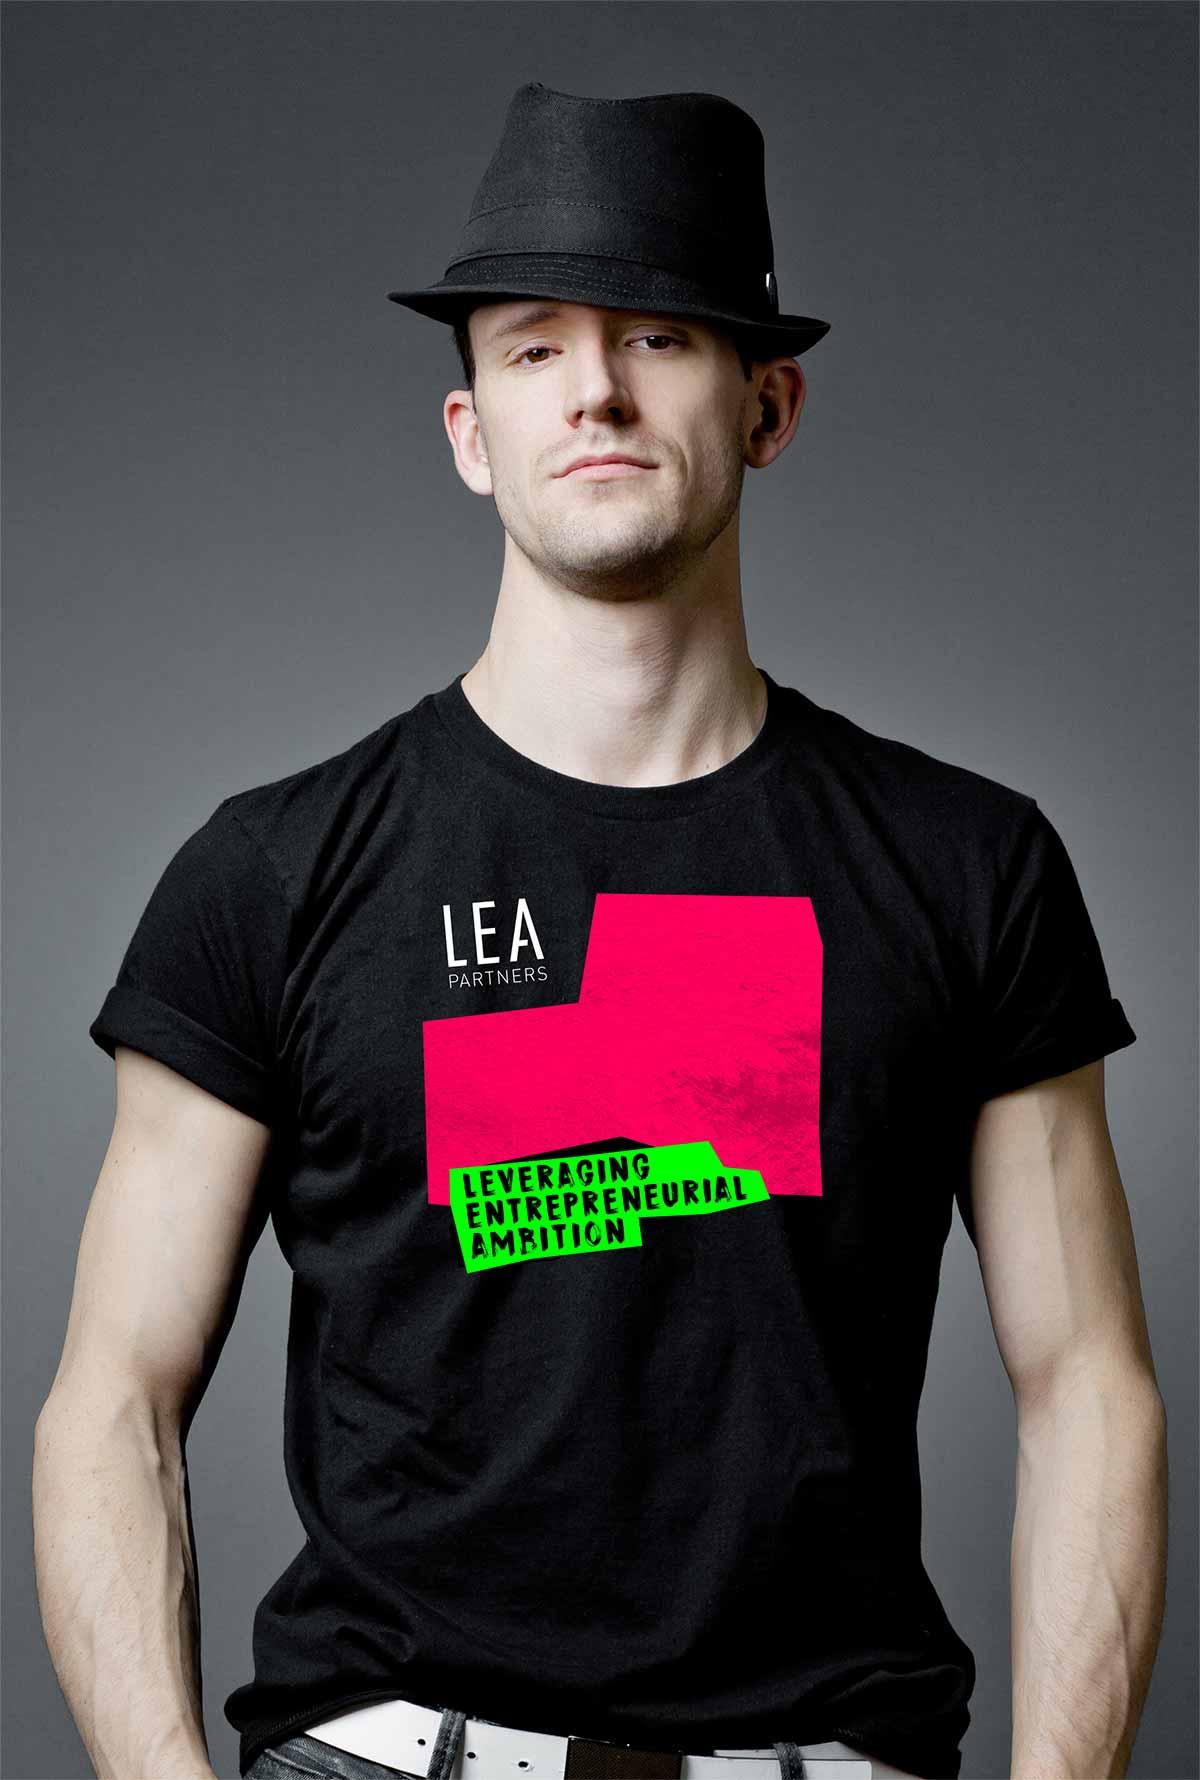 LEA Partners T-Shirt Design